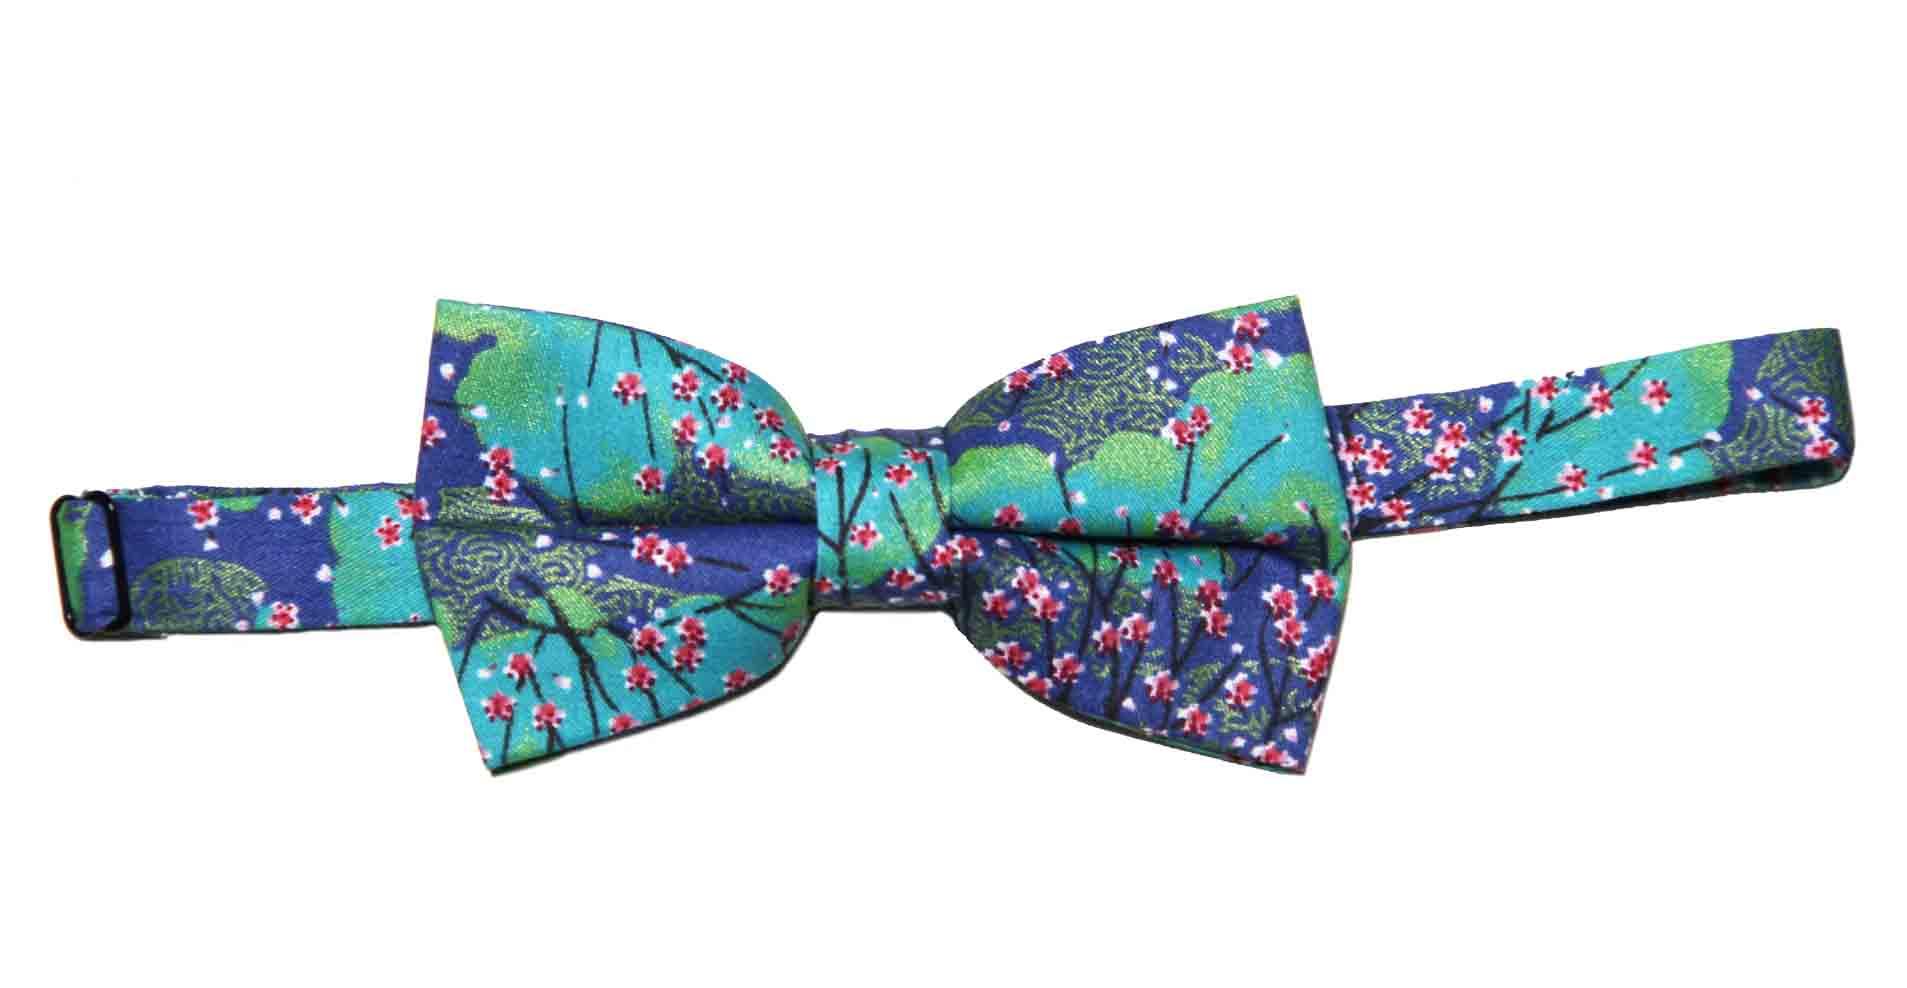 Gascoigne Floral Bow Tie Green Pink White Black Navy Blue Cotton Men's